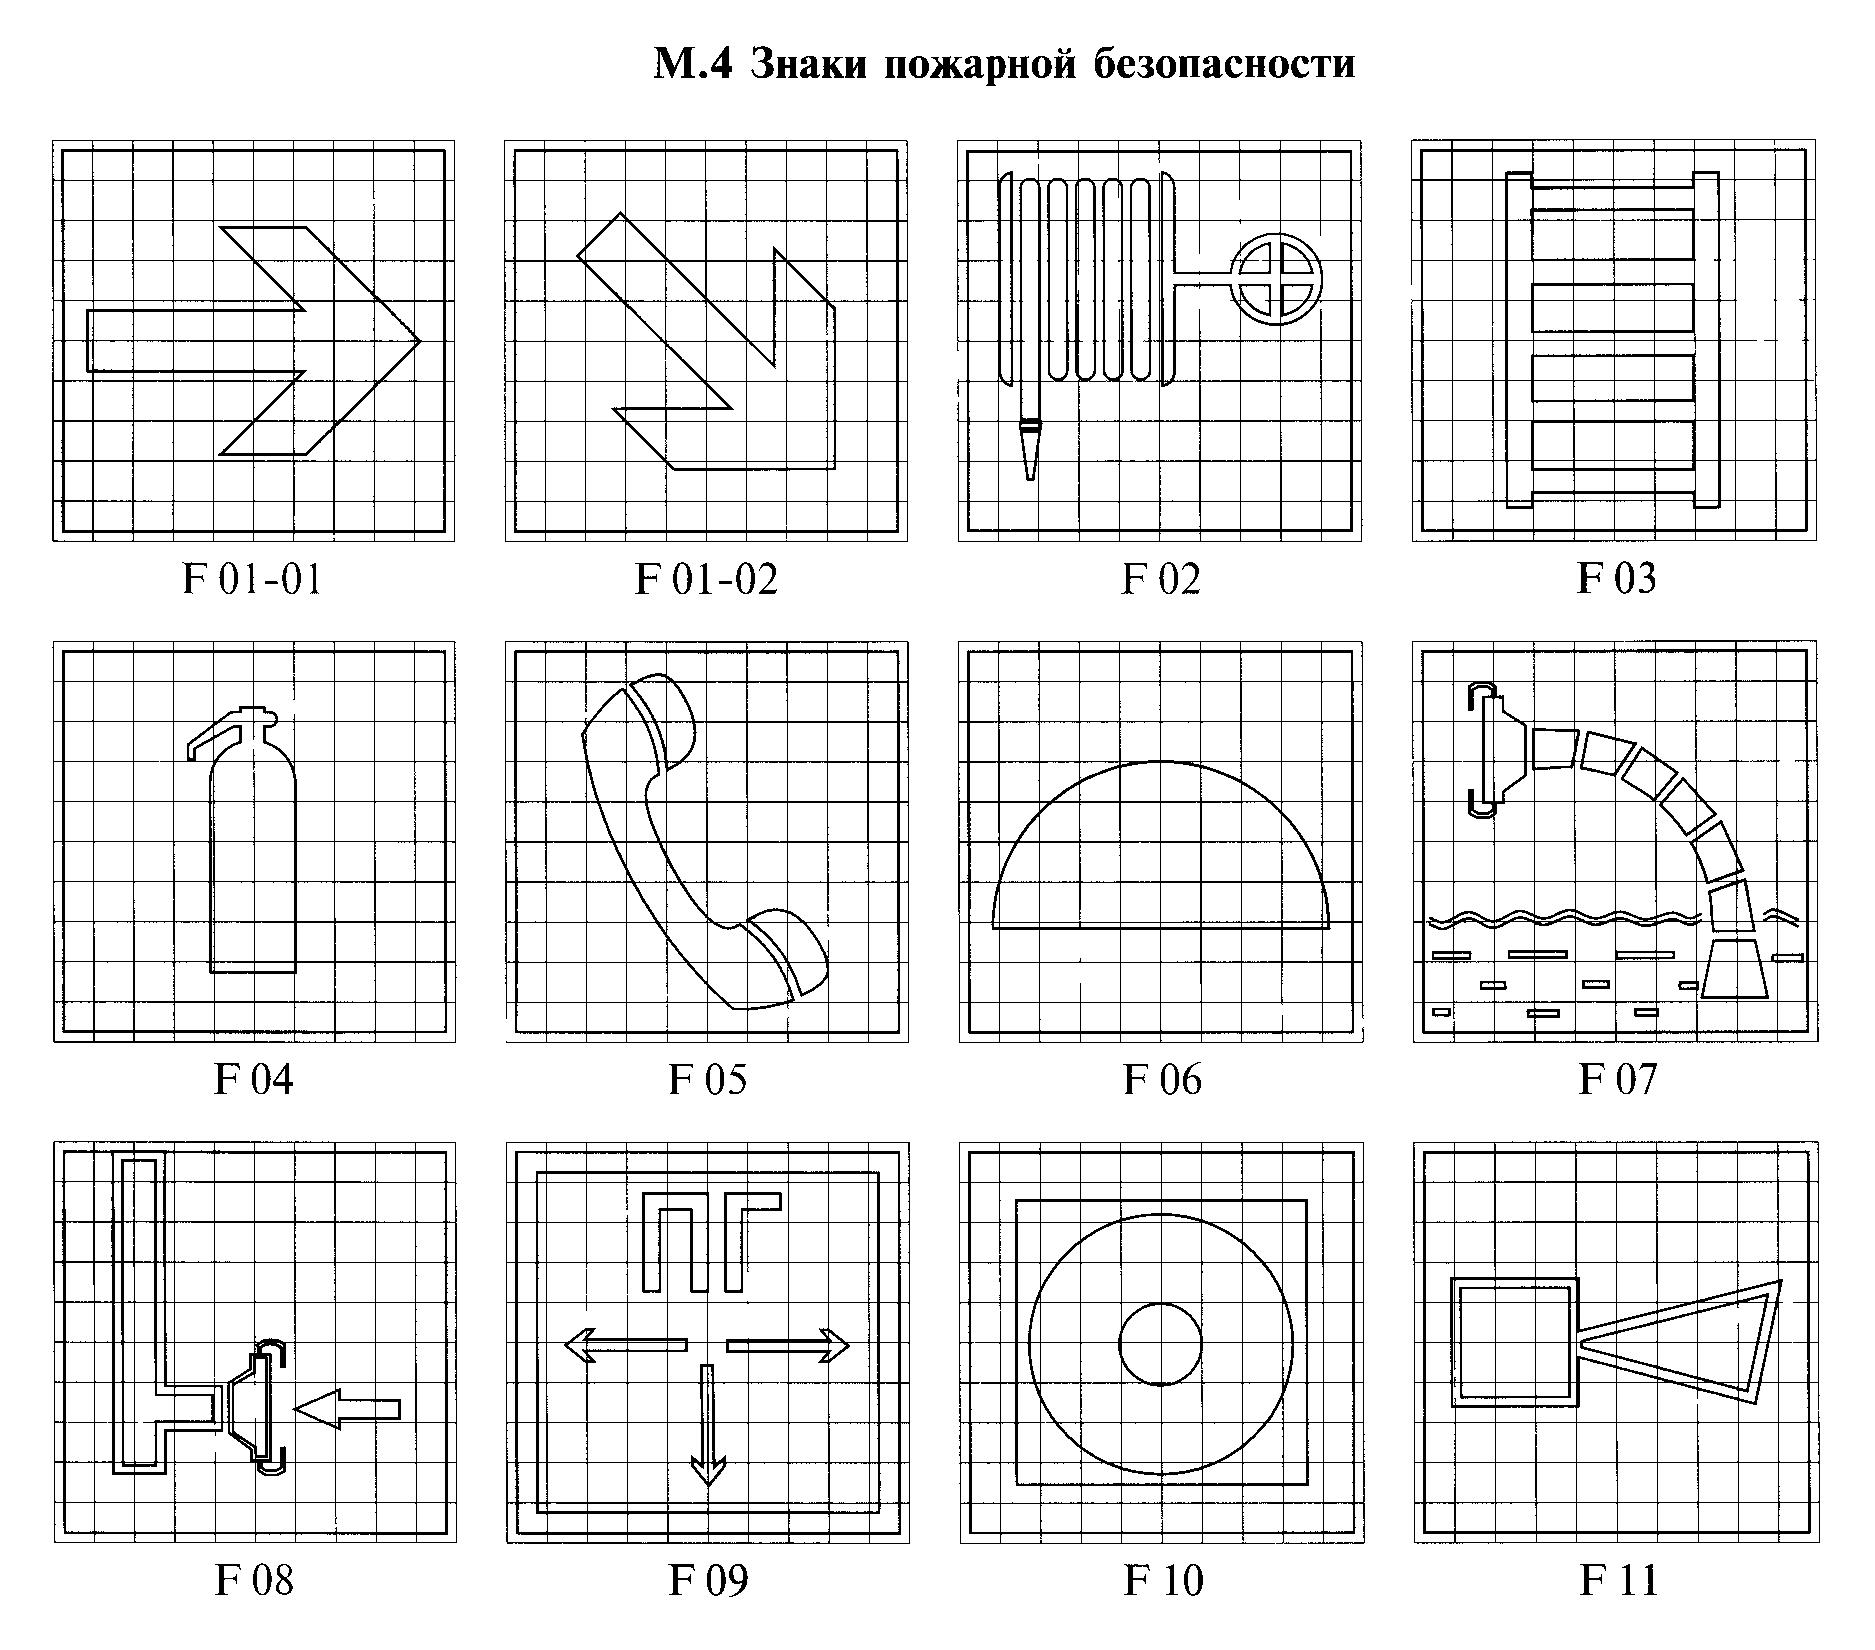 РИСУНОК М.4. К ГОСТ Р 12.4.026-2001